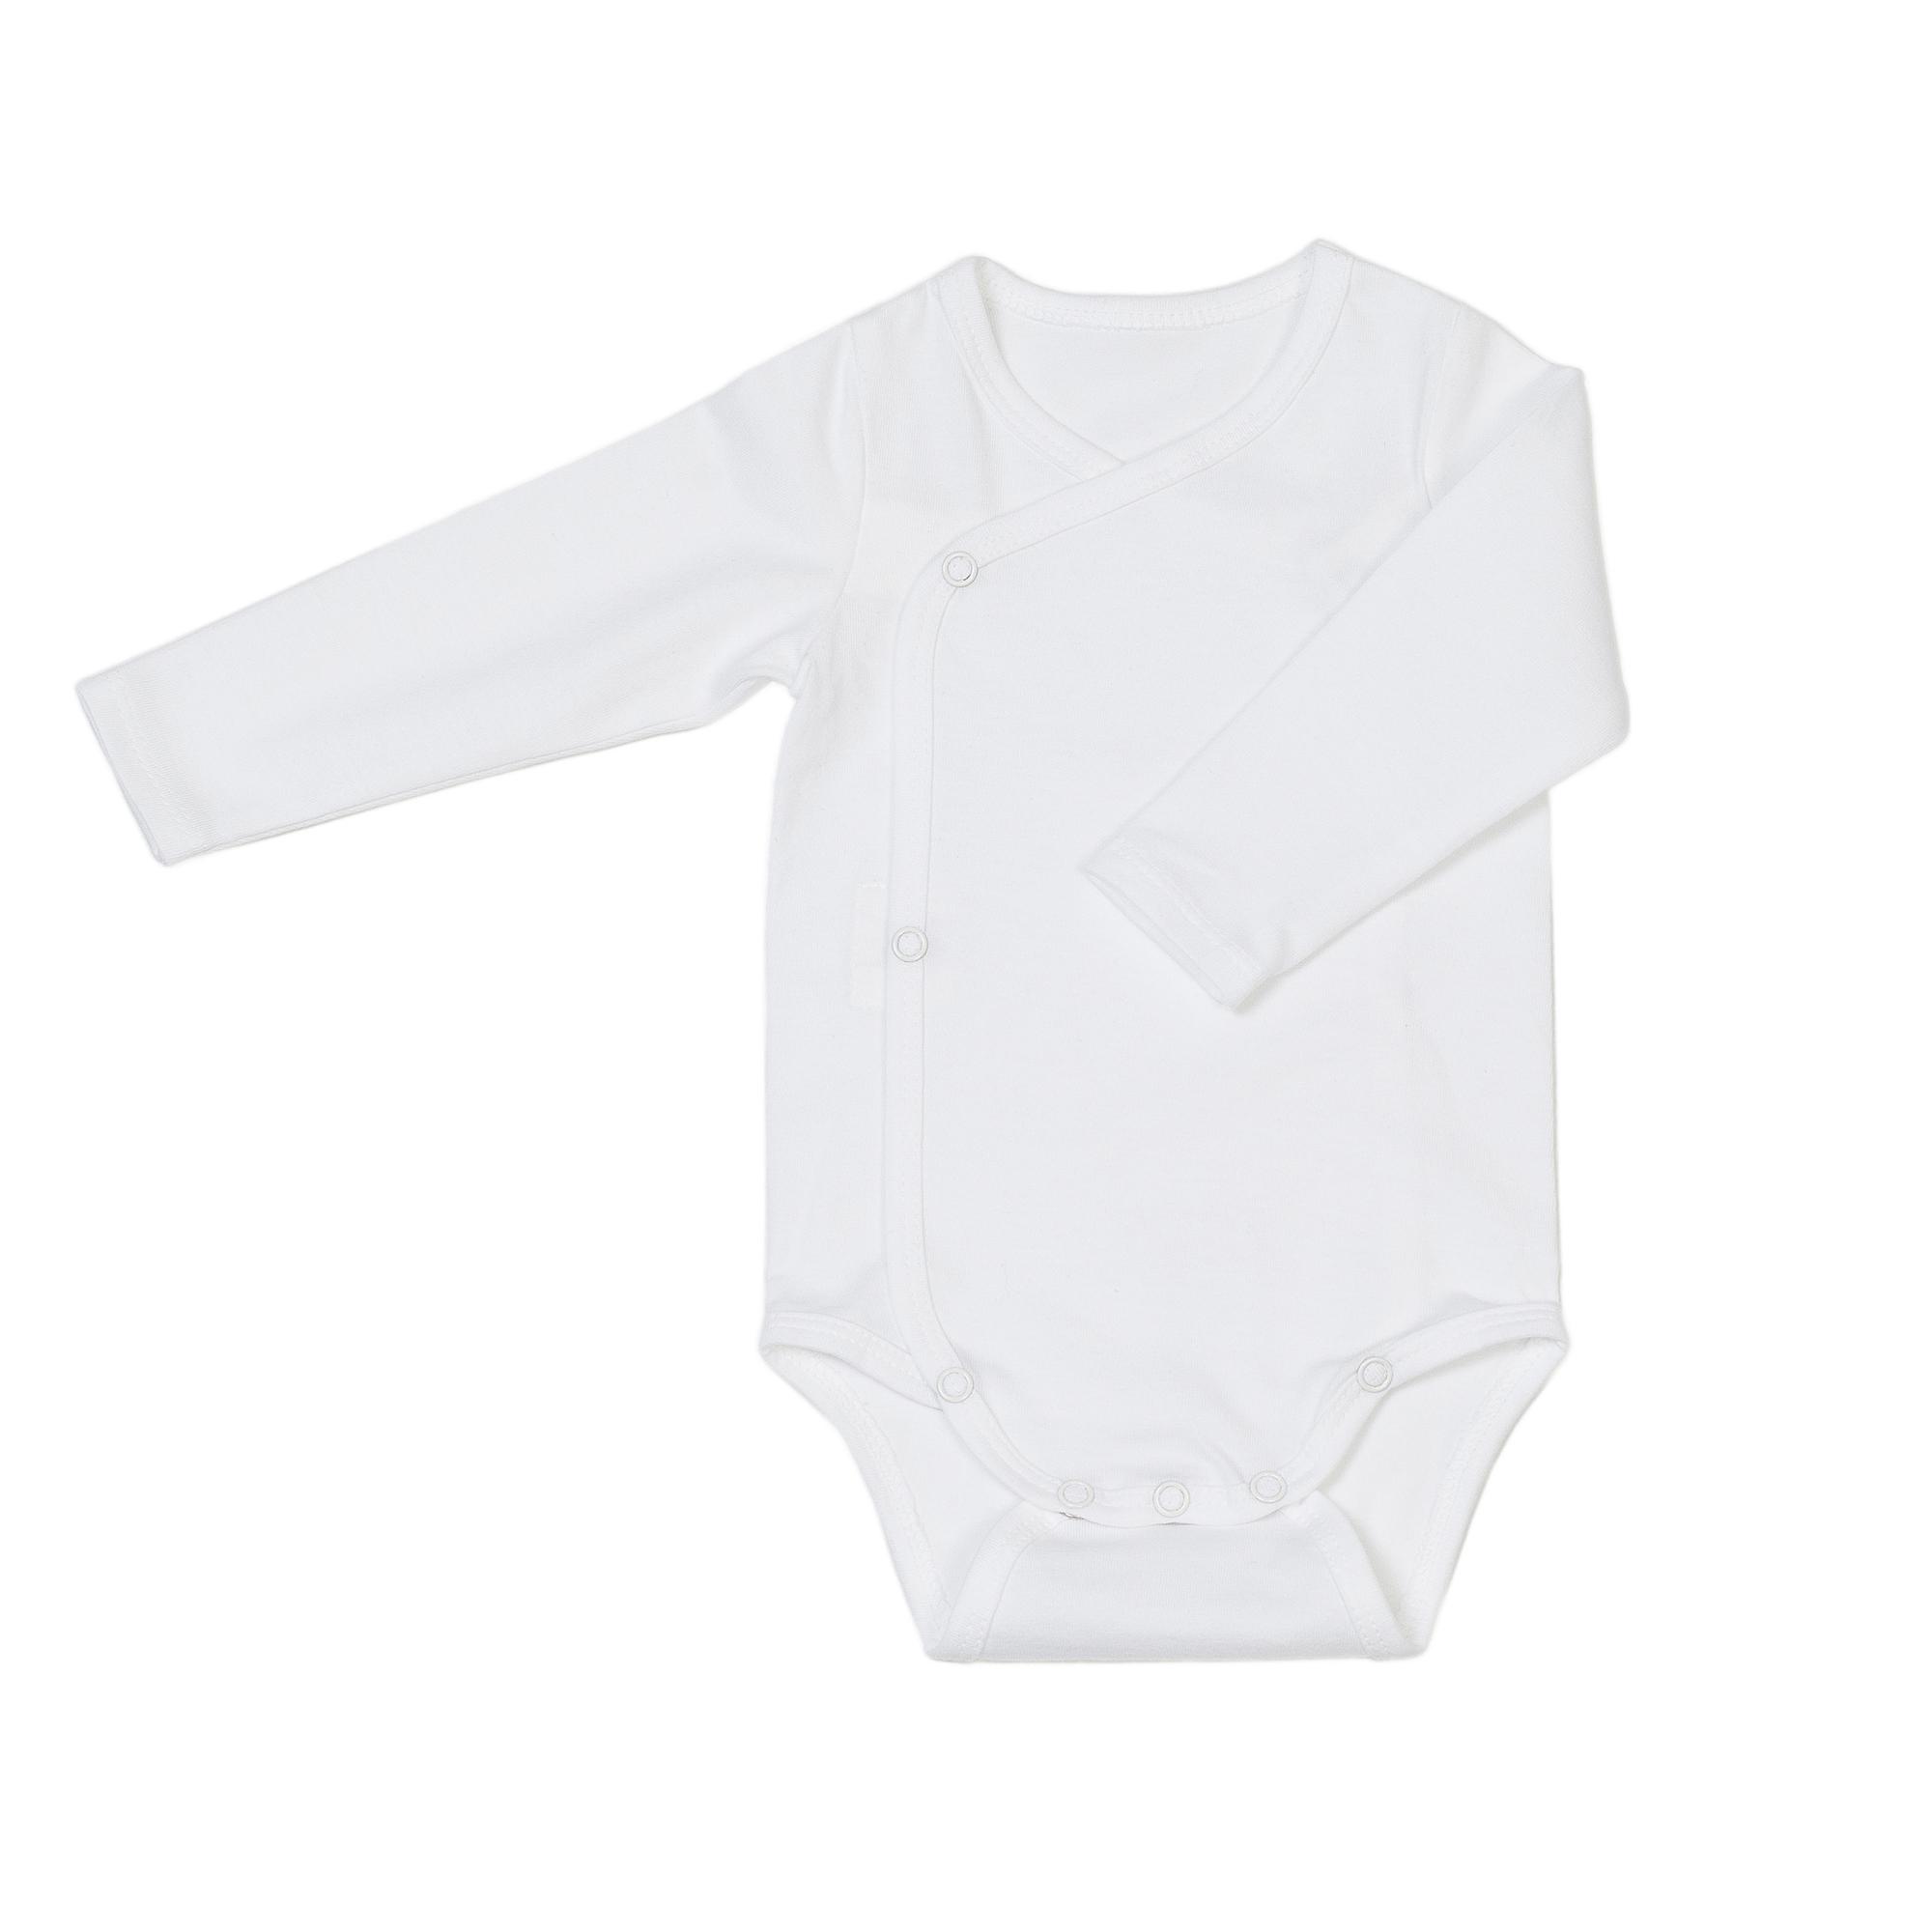 Newborn organic cotton baby bodysuit white